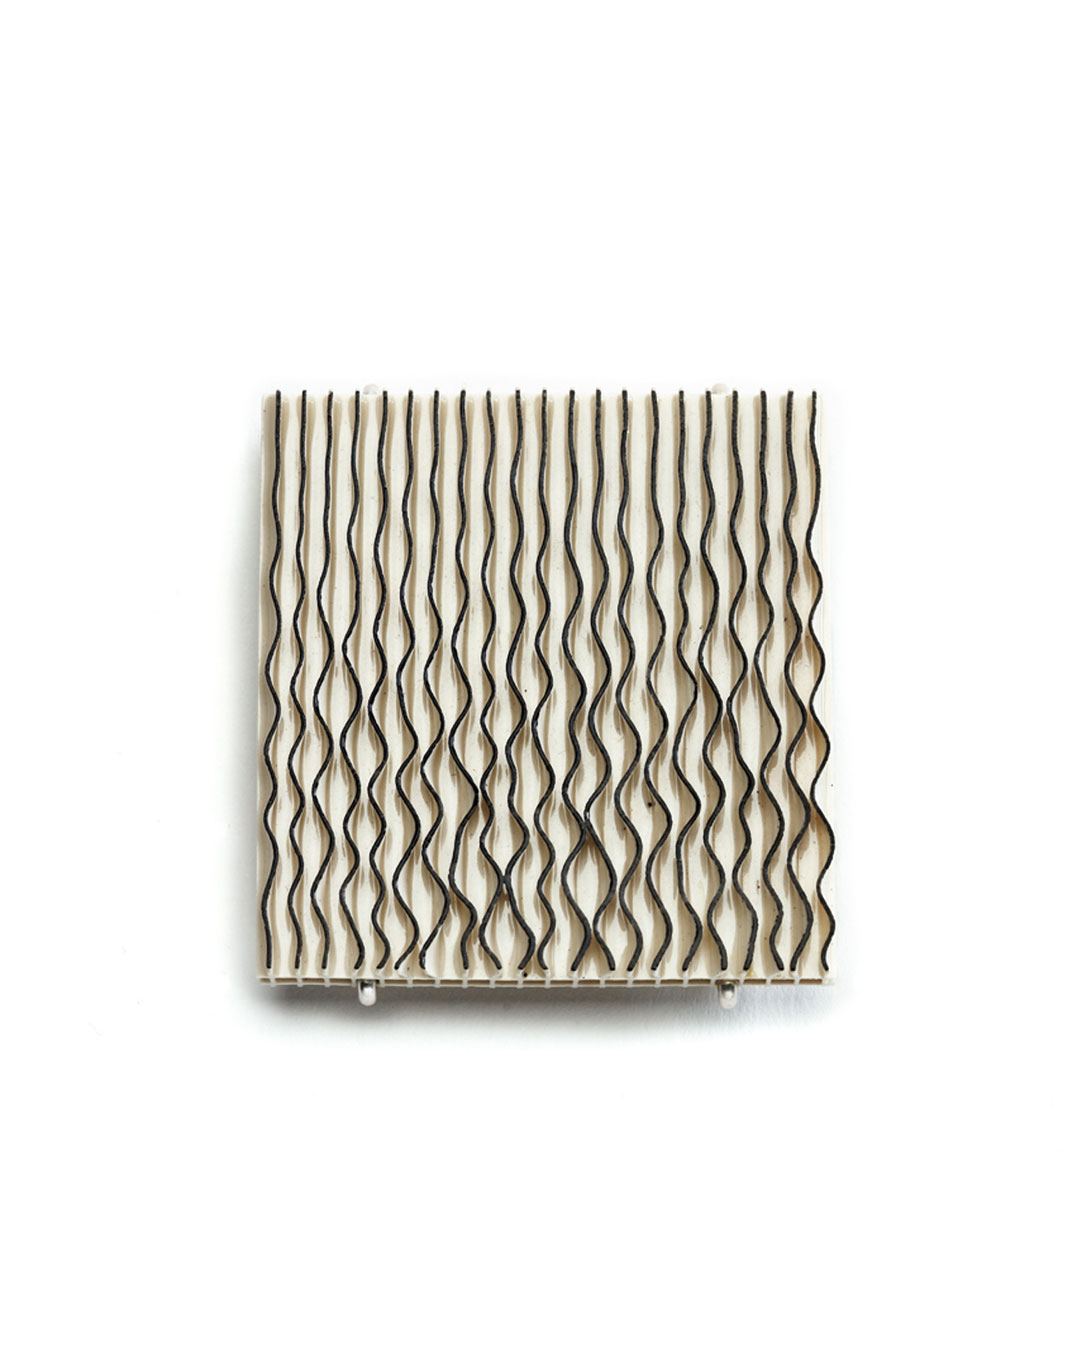 Silke Trekel, Strömung (Current), 2017, brooch; porcelain, silver, 57 x 54 x 7 mm, €920